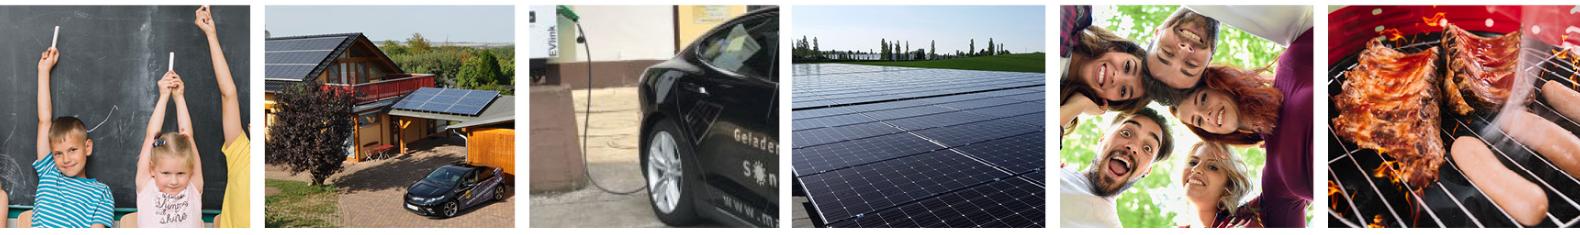 Hausmesse & Solarparty Thüringen